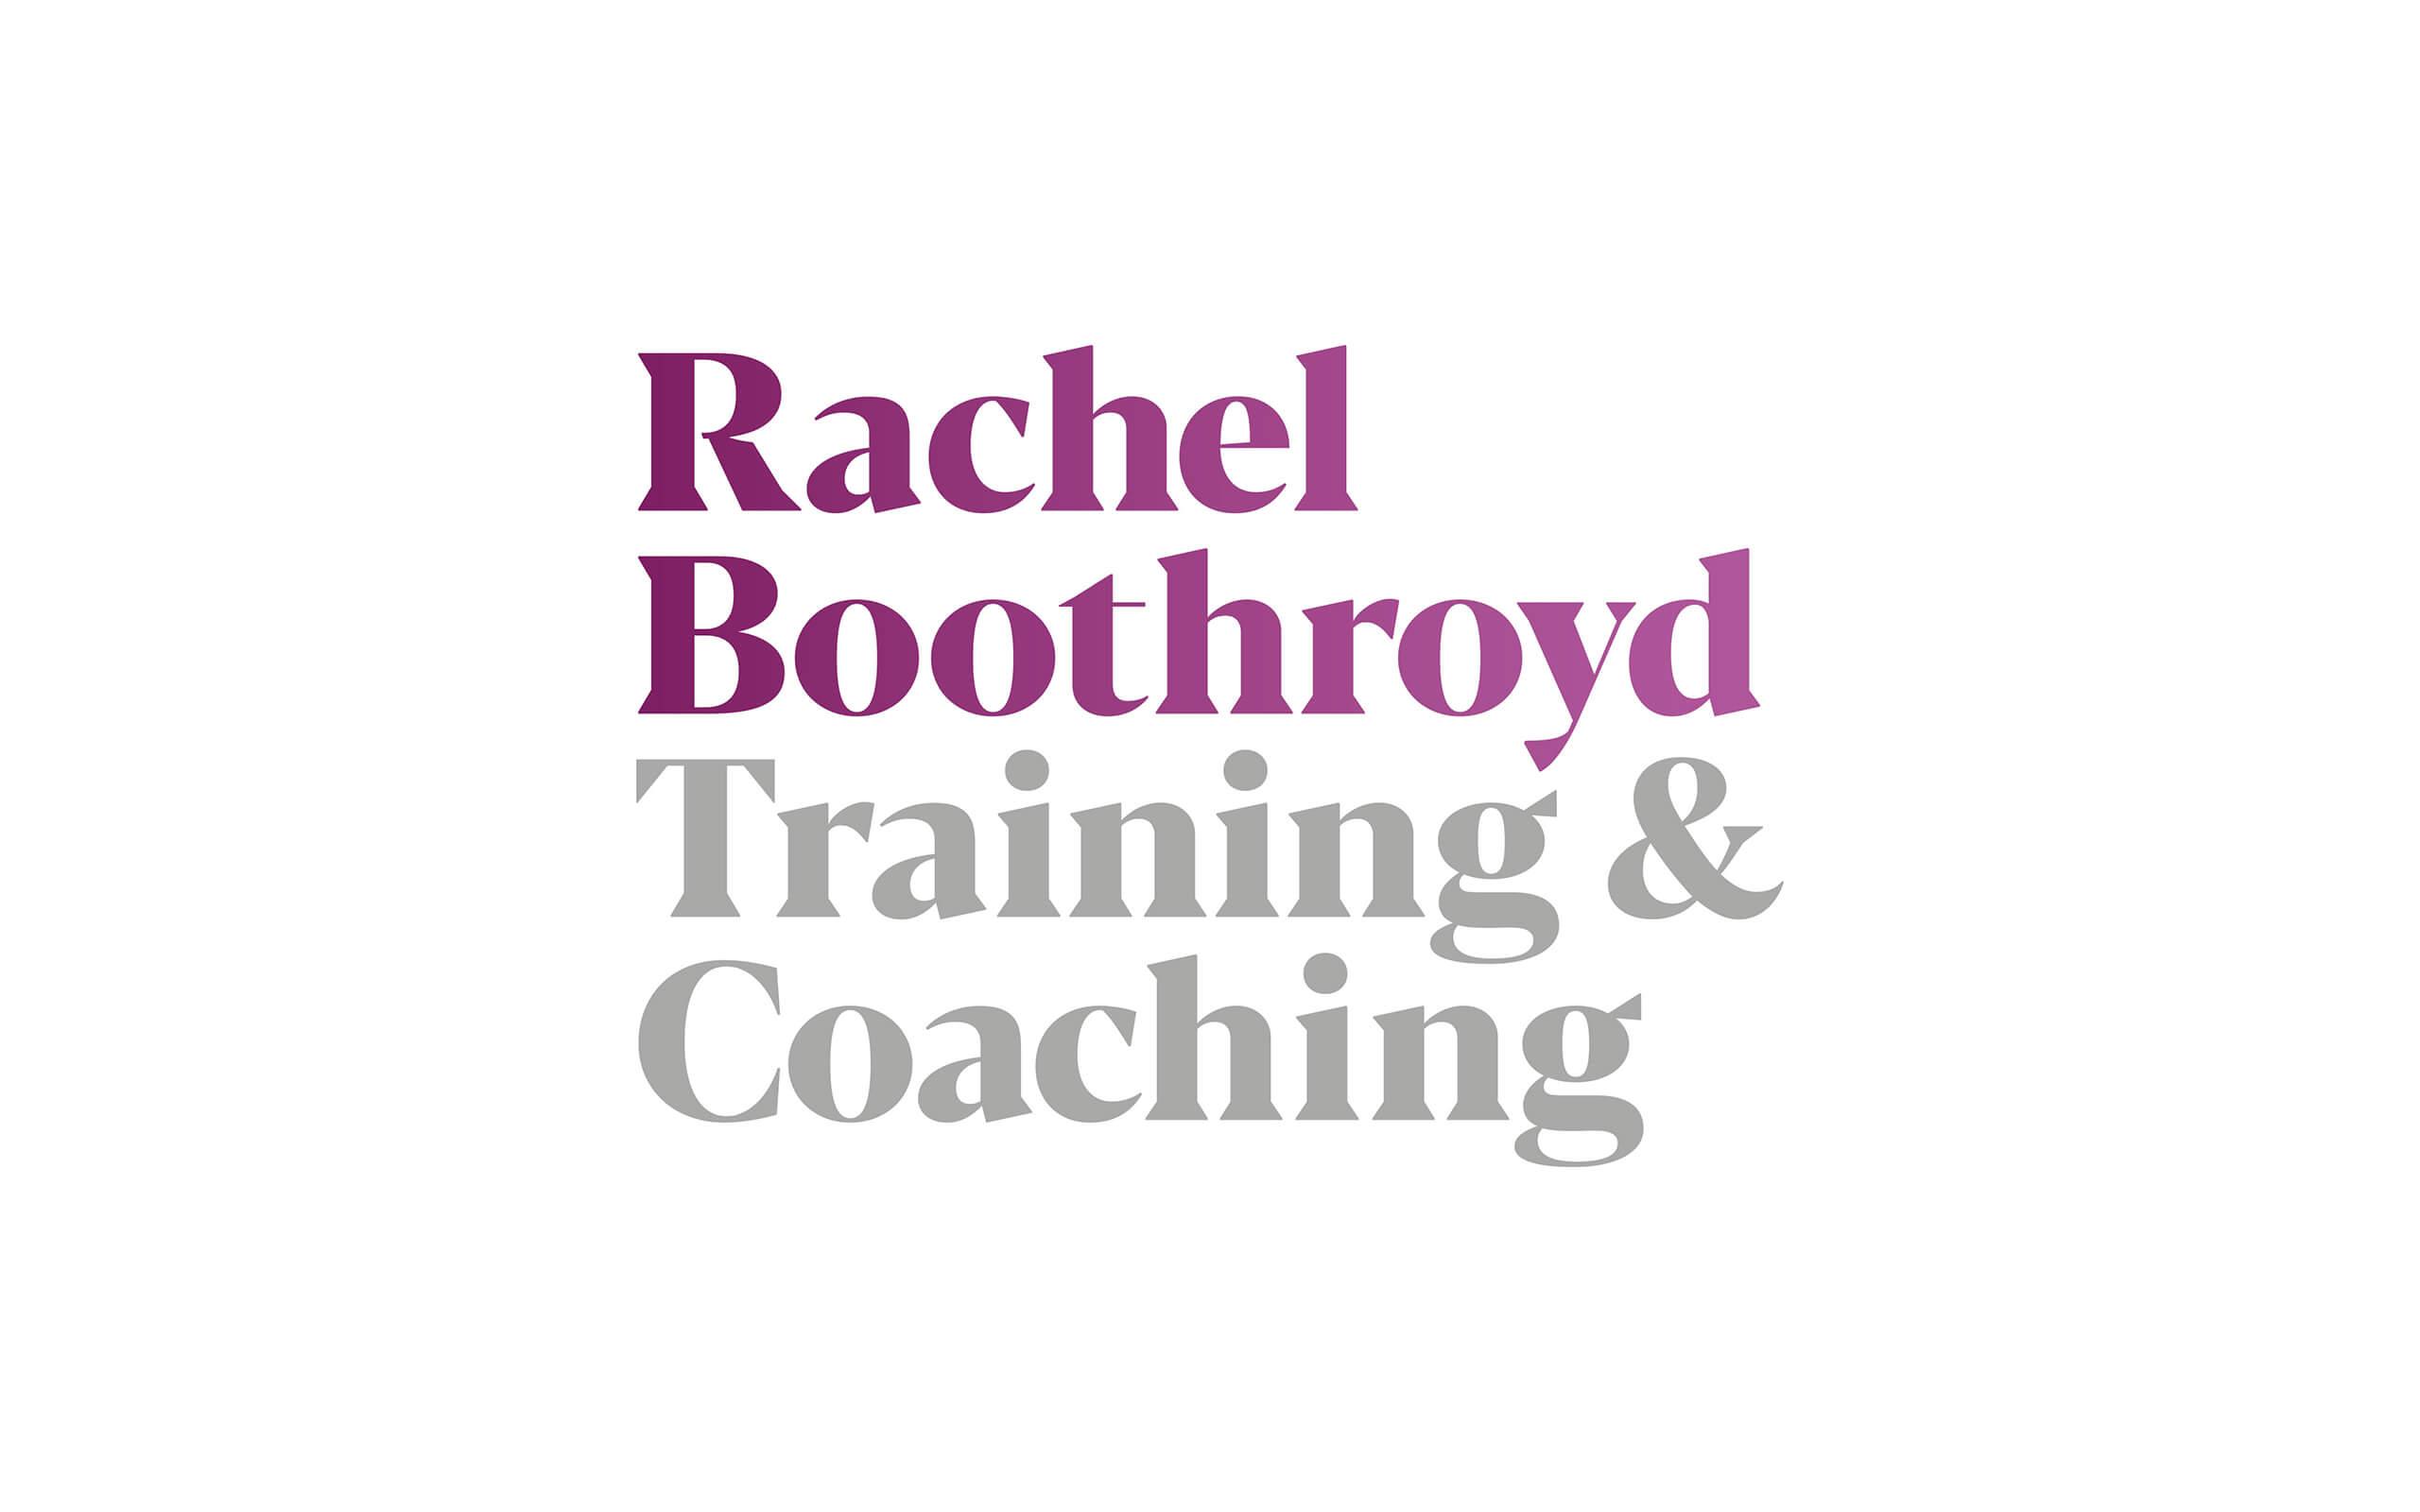 Rachel Boothroyd Training and Coaching brand logo